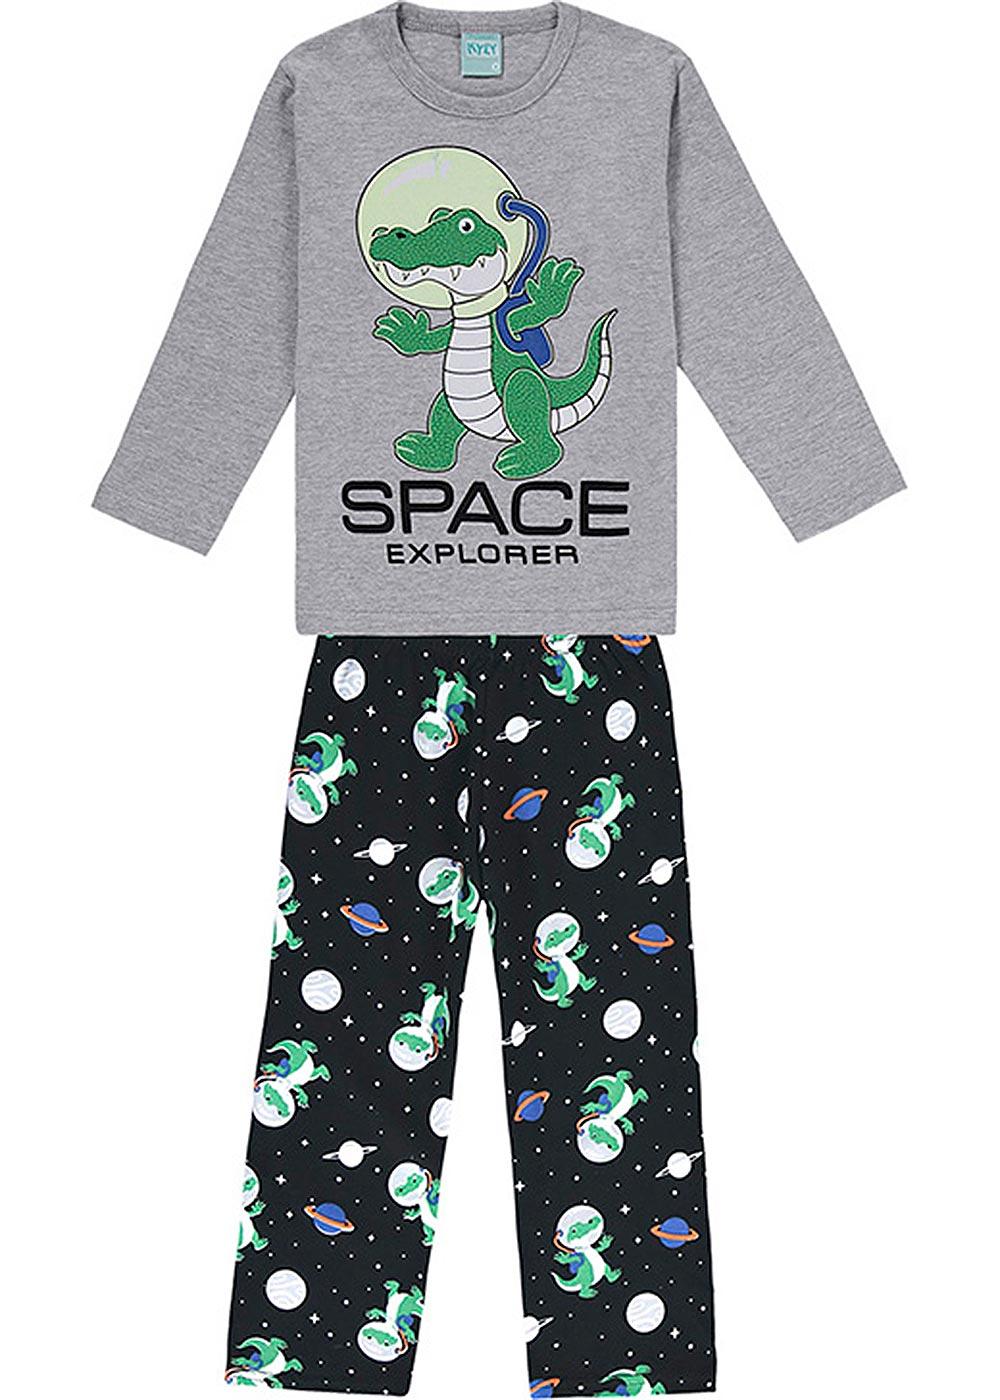 Pijama Infantil Masculino Inverno Cinza Space Explorer Brilha no Escuro - Kyly